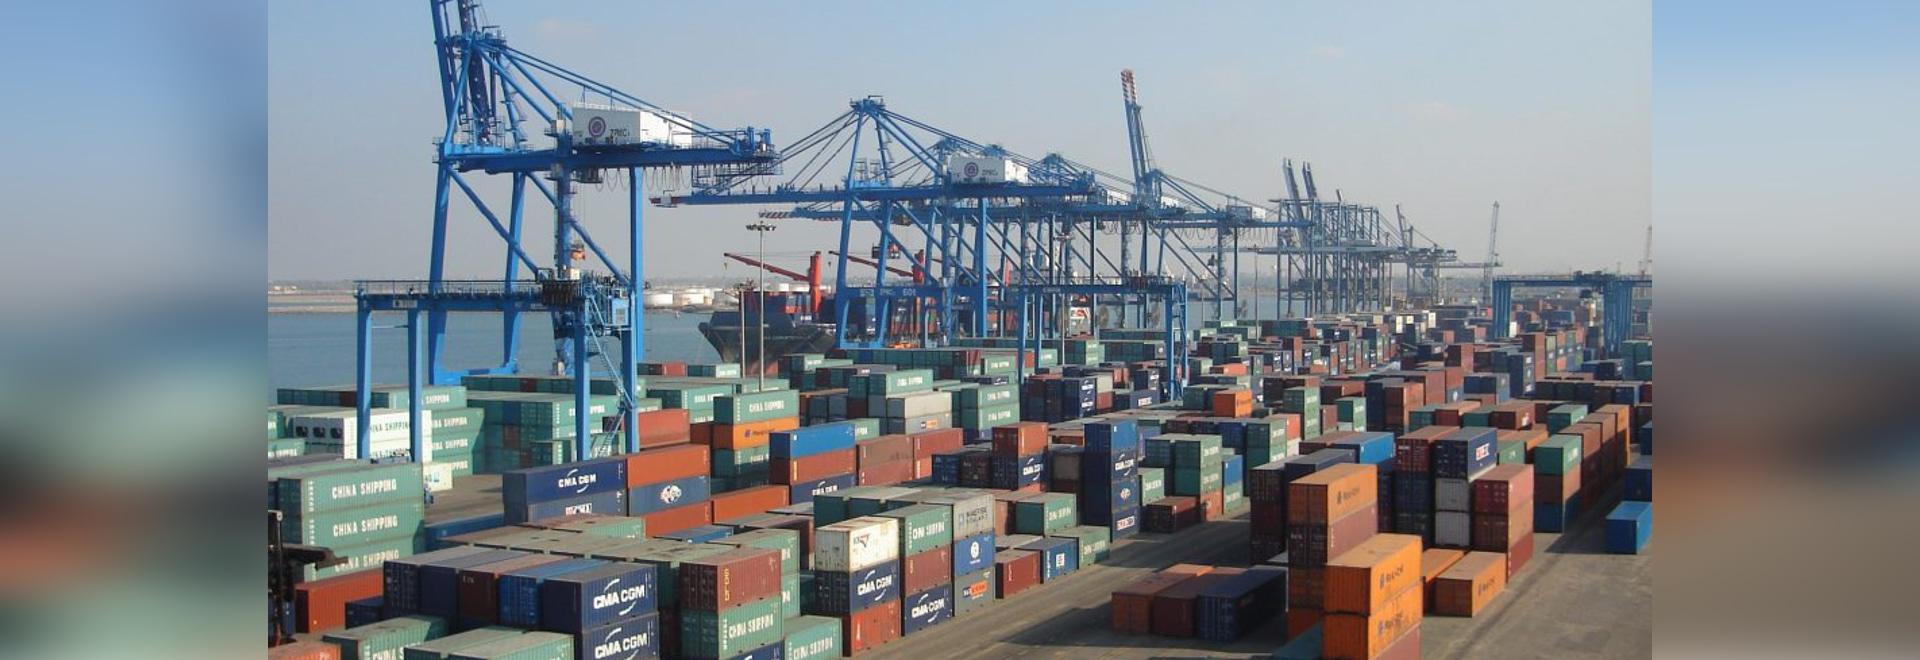 Damietta Port